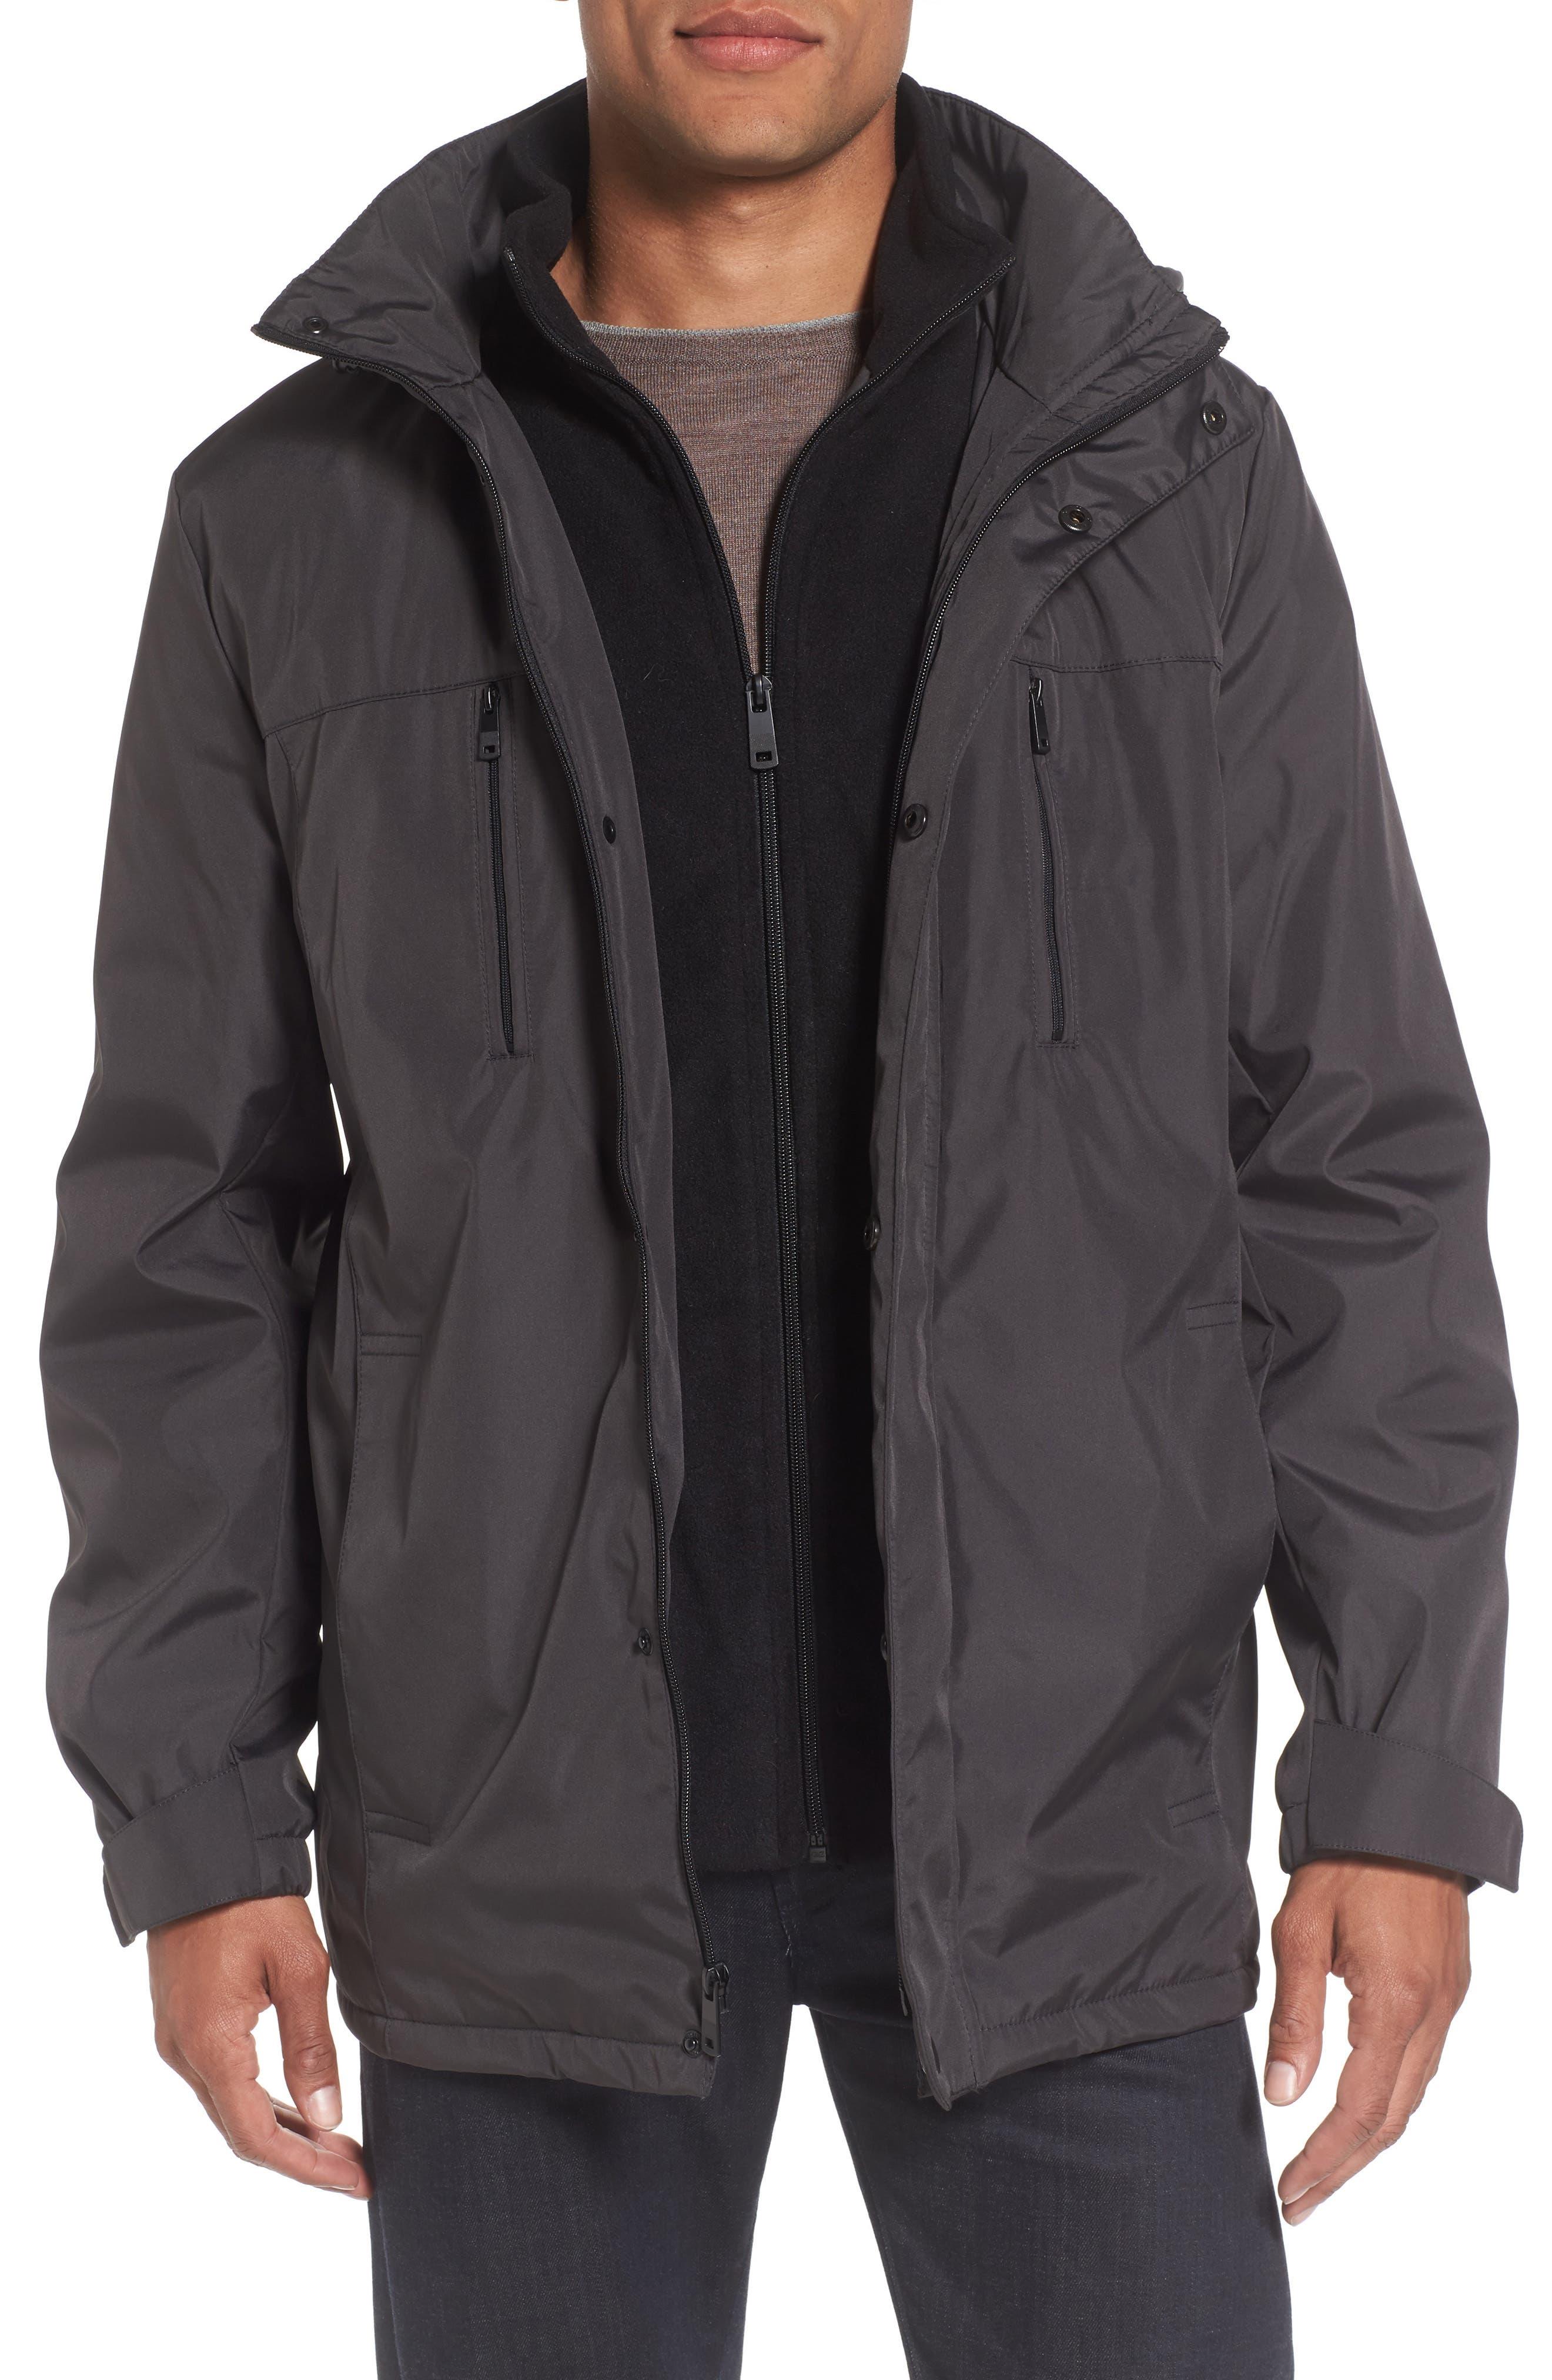 Hooded Jacket with Inset Fleece Bib,                             Main thumbnail 2, color,